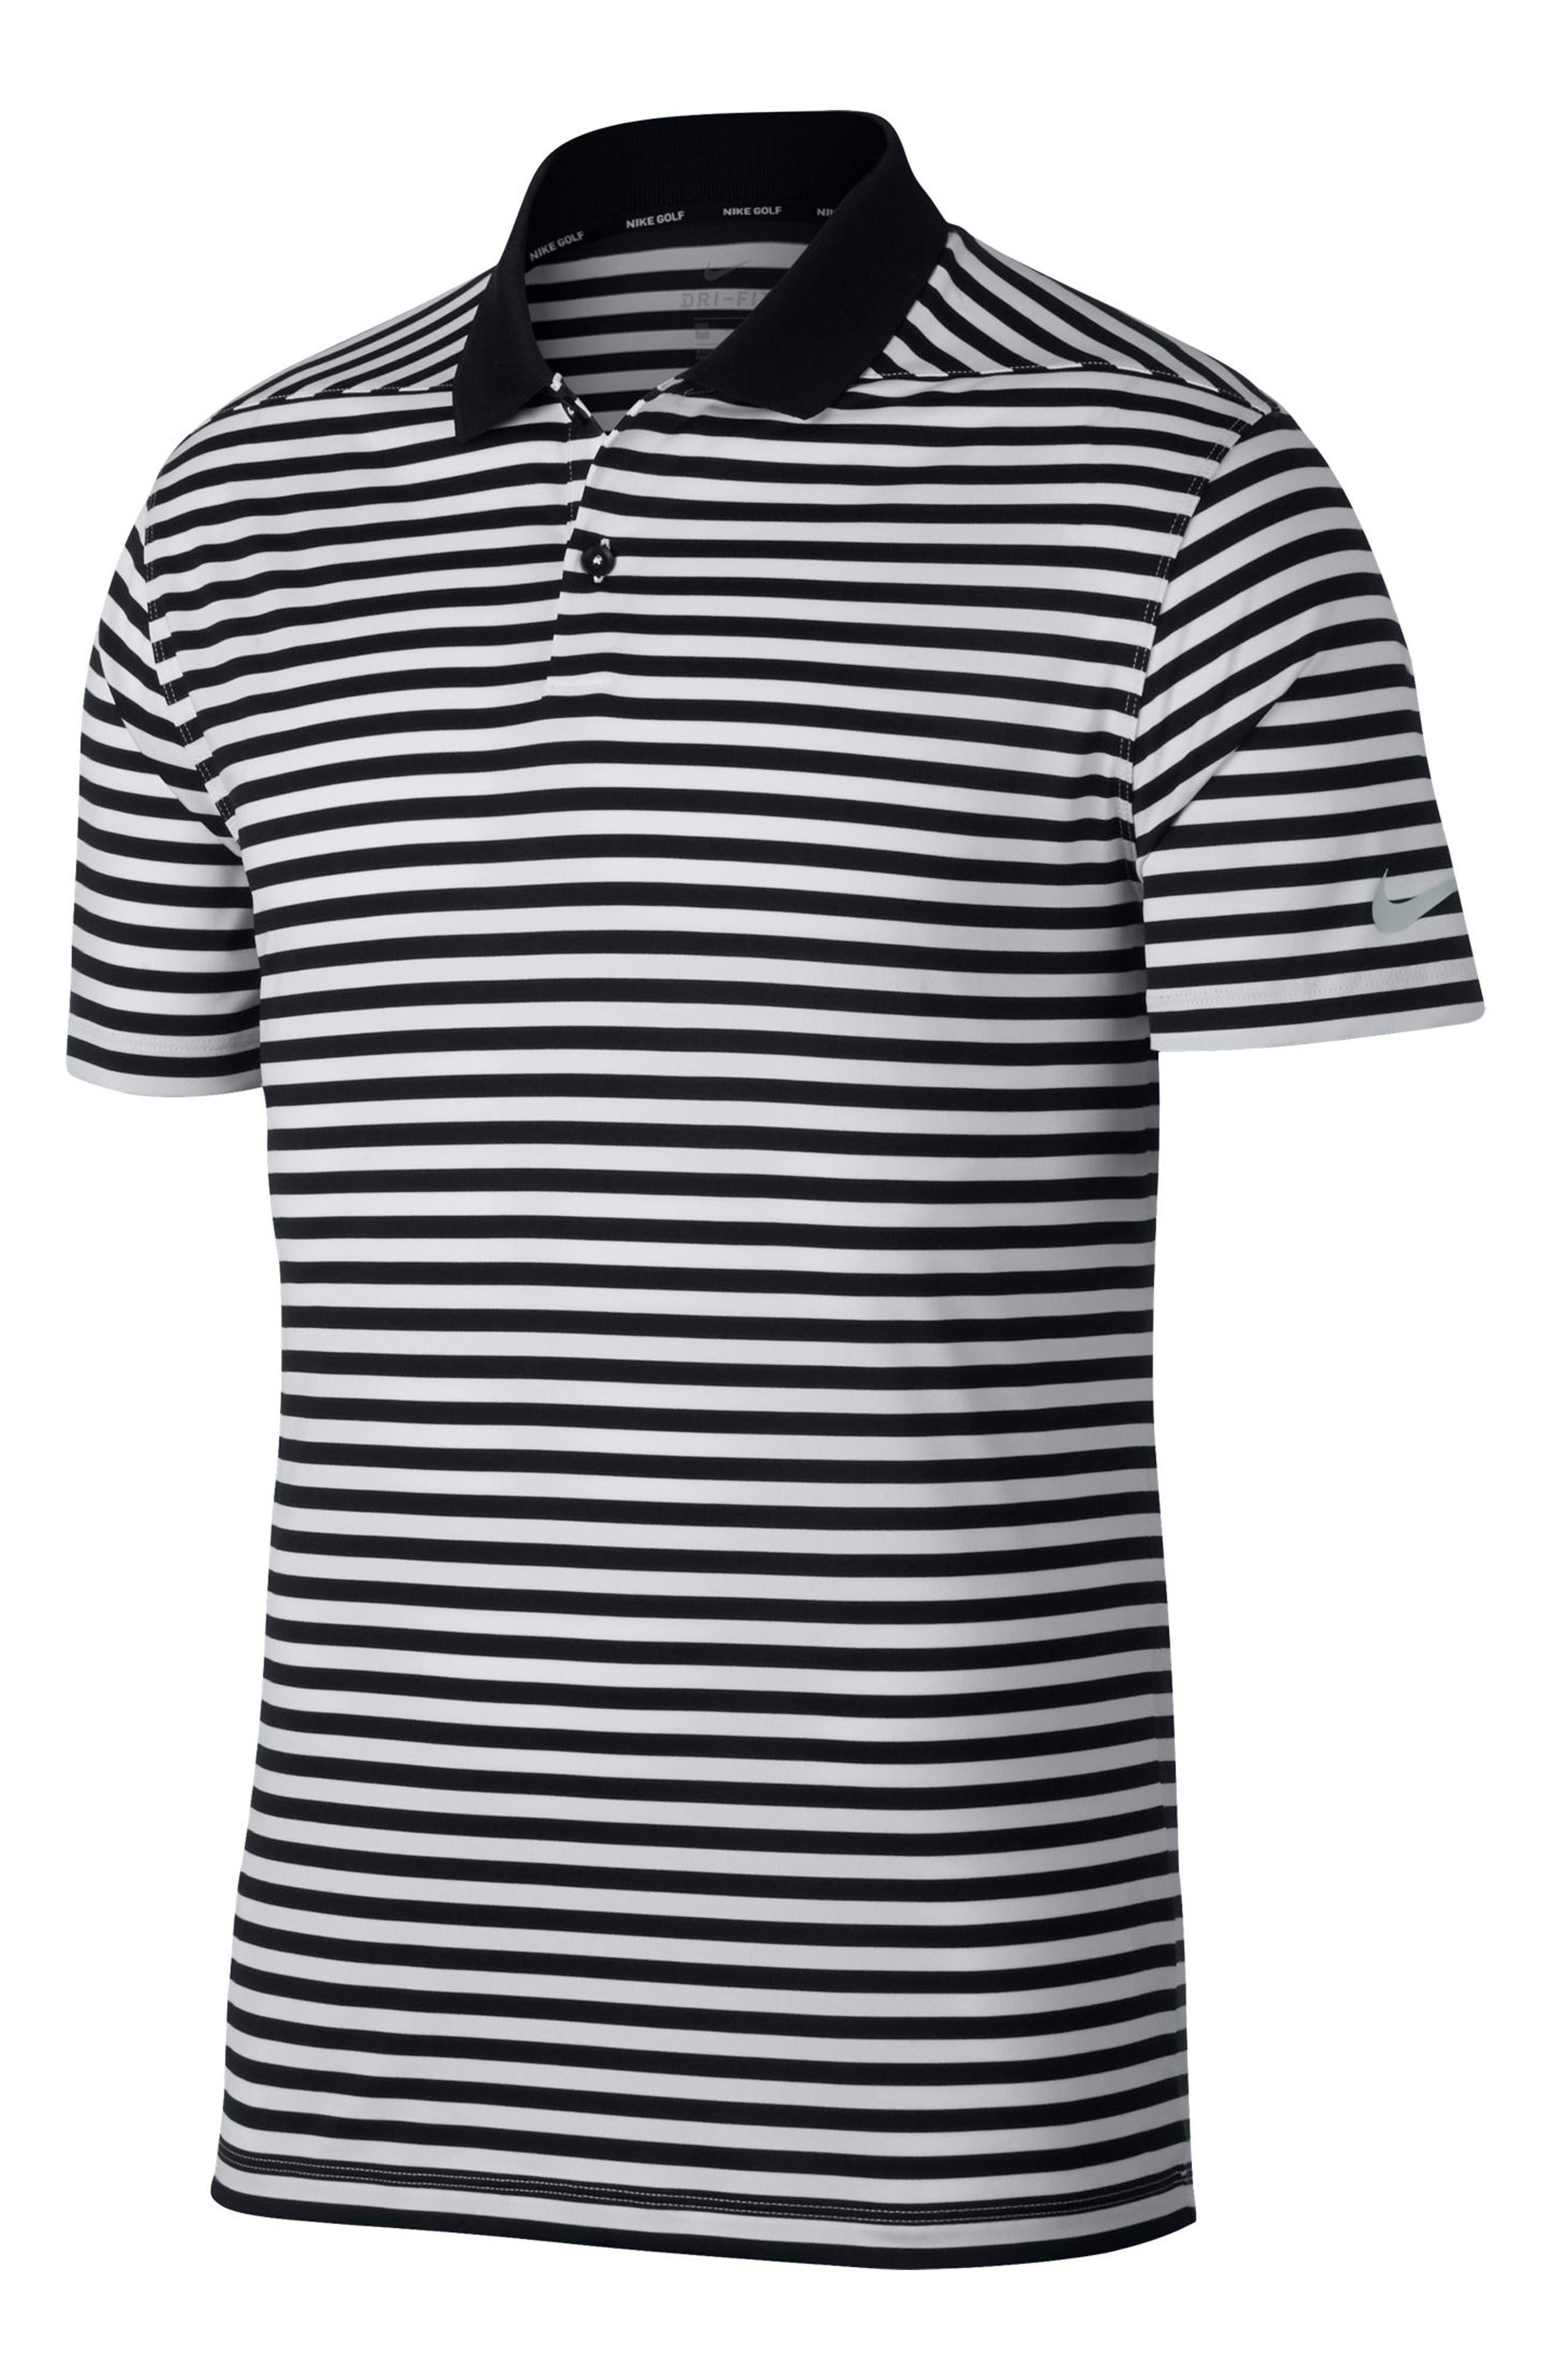 NIKE, Victory Stripe Dri-FIT Golf Polo, Alternate thumbnail 5, color, BLACK/ WHITE/COOL GREY